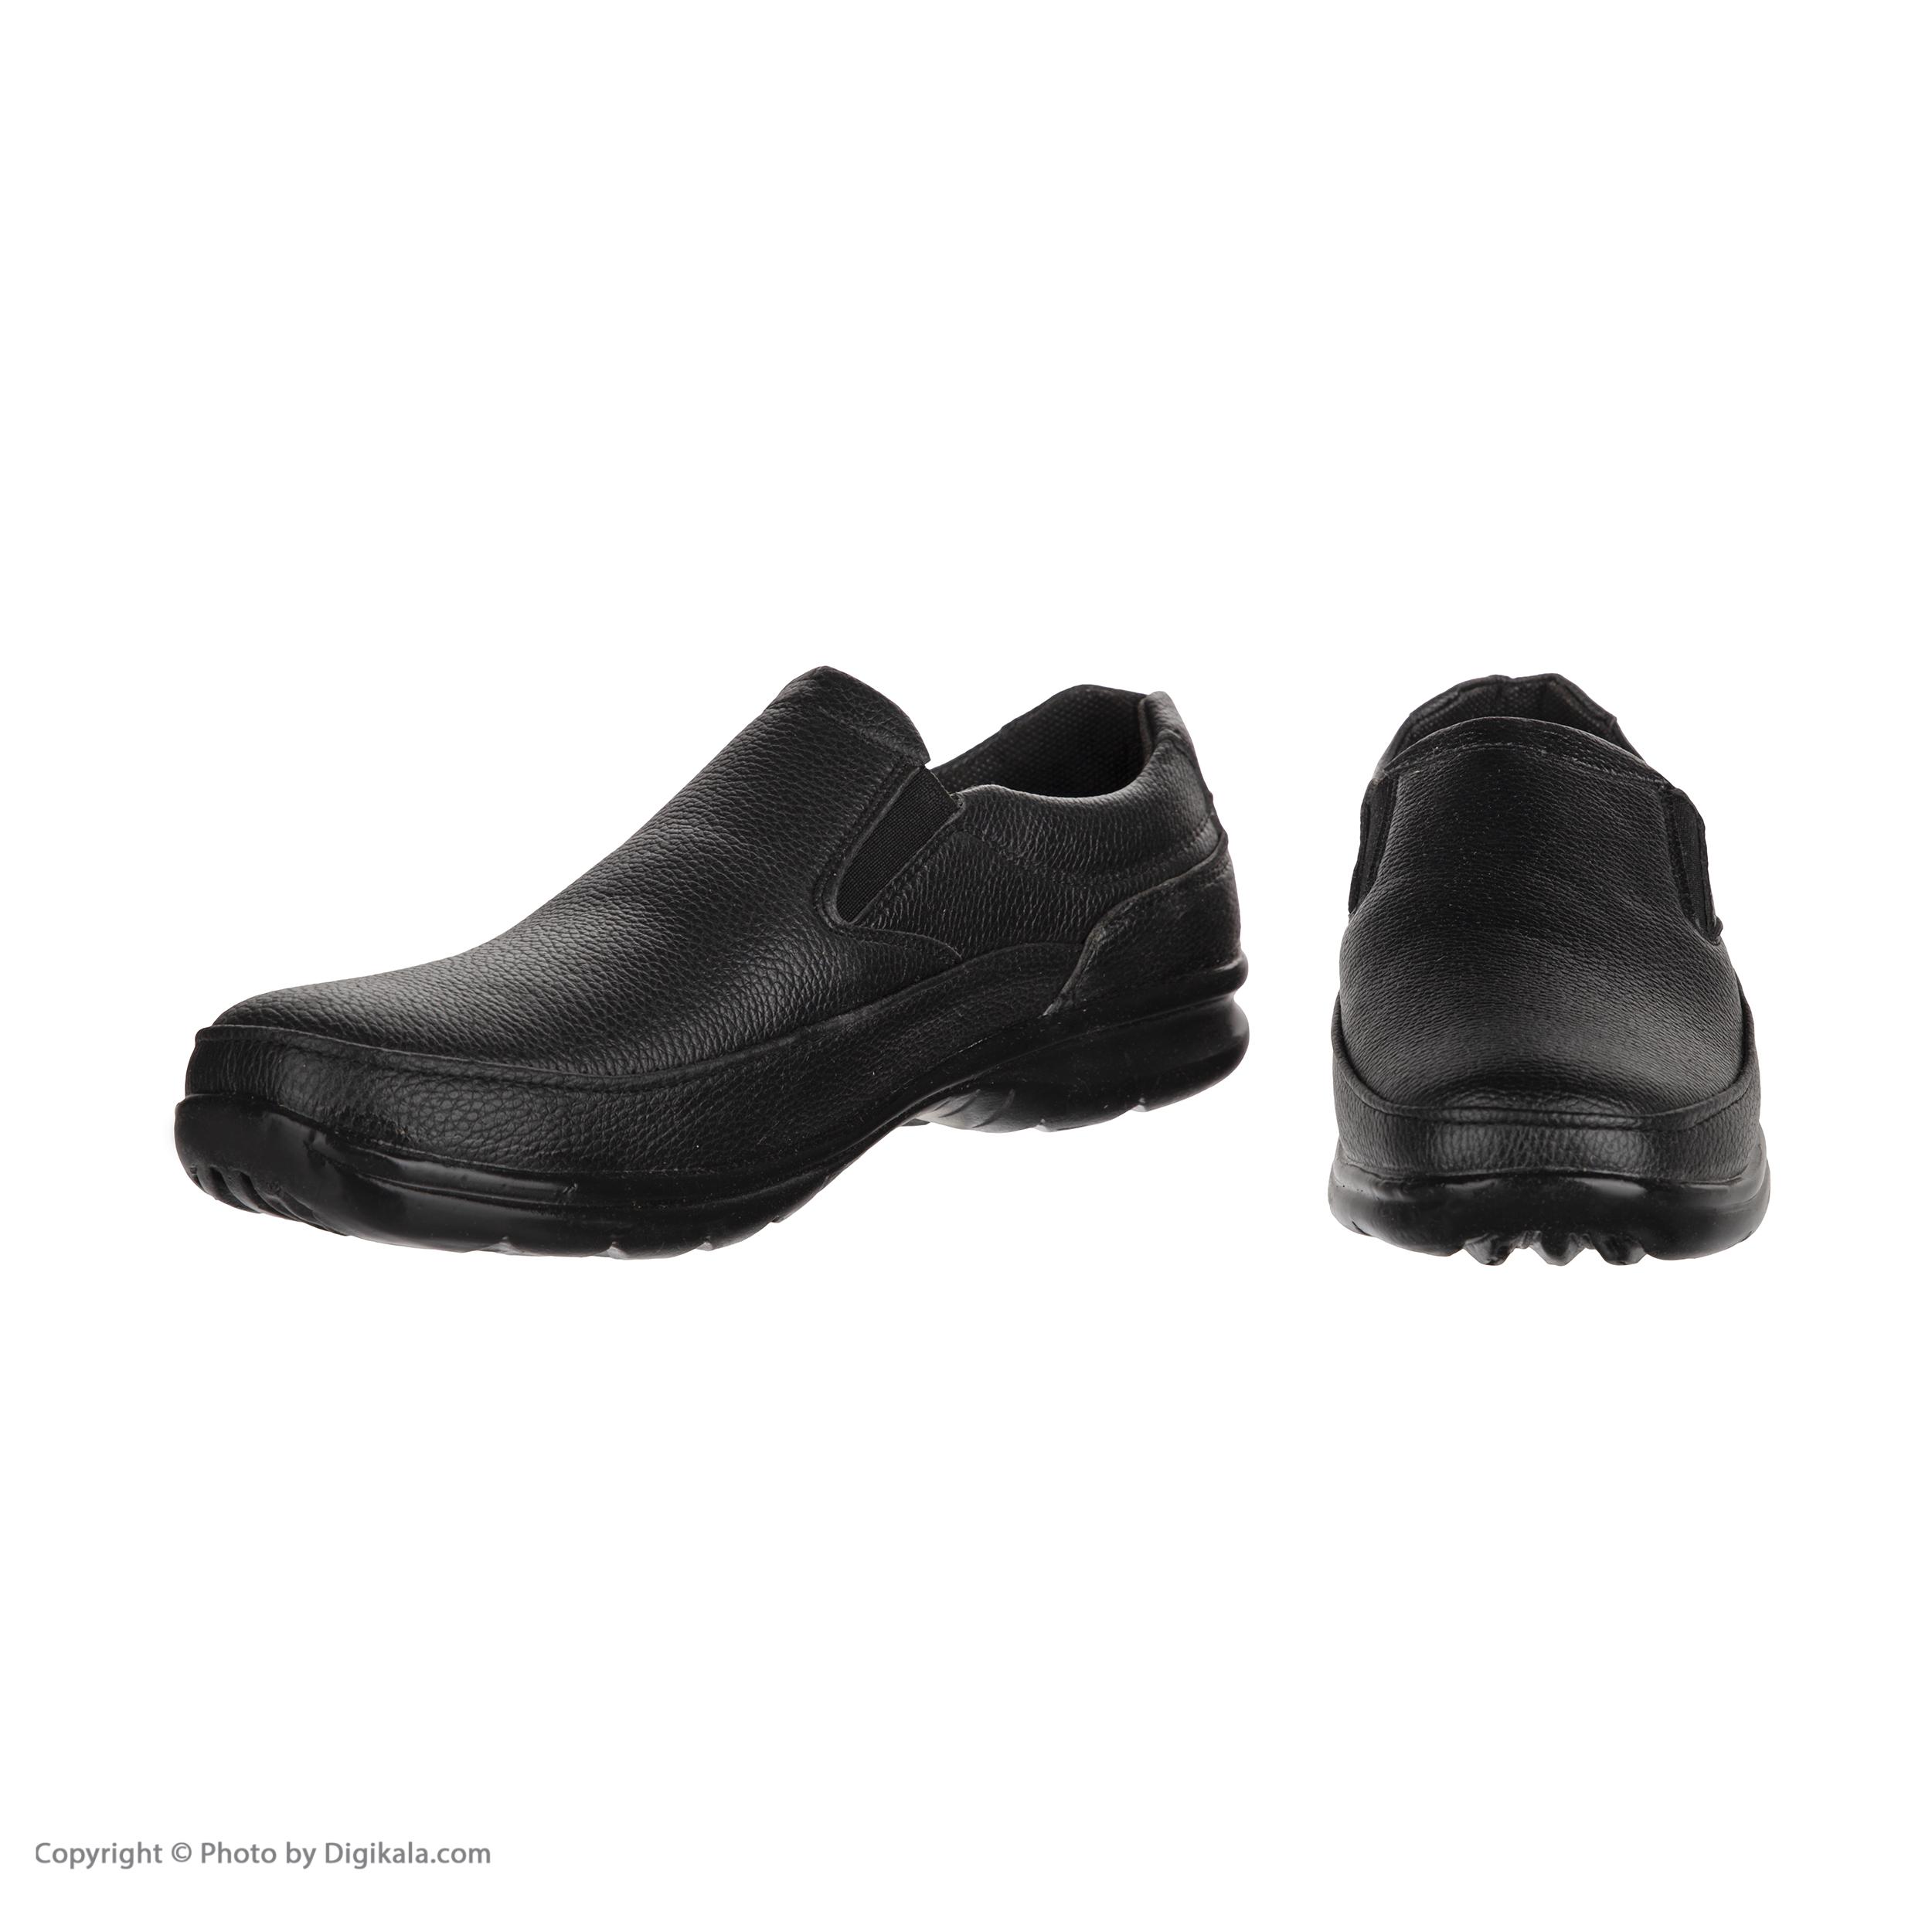 کفش روزمره مردانه مدل k.baz.074 -  - 6